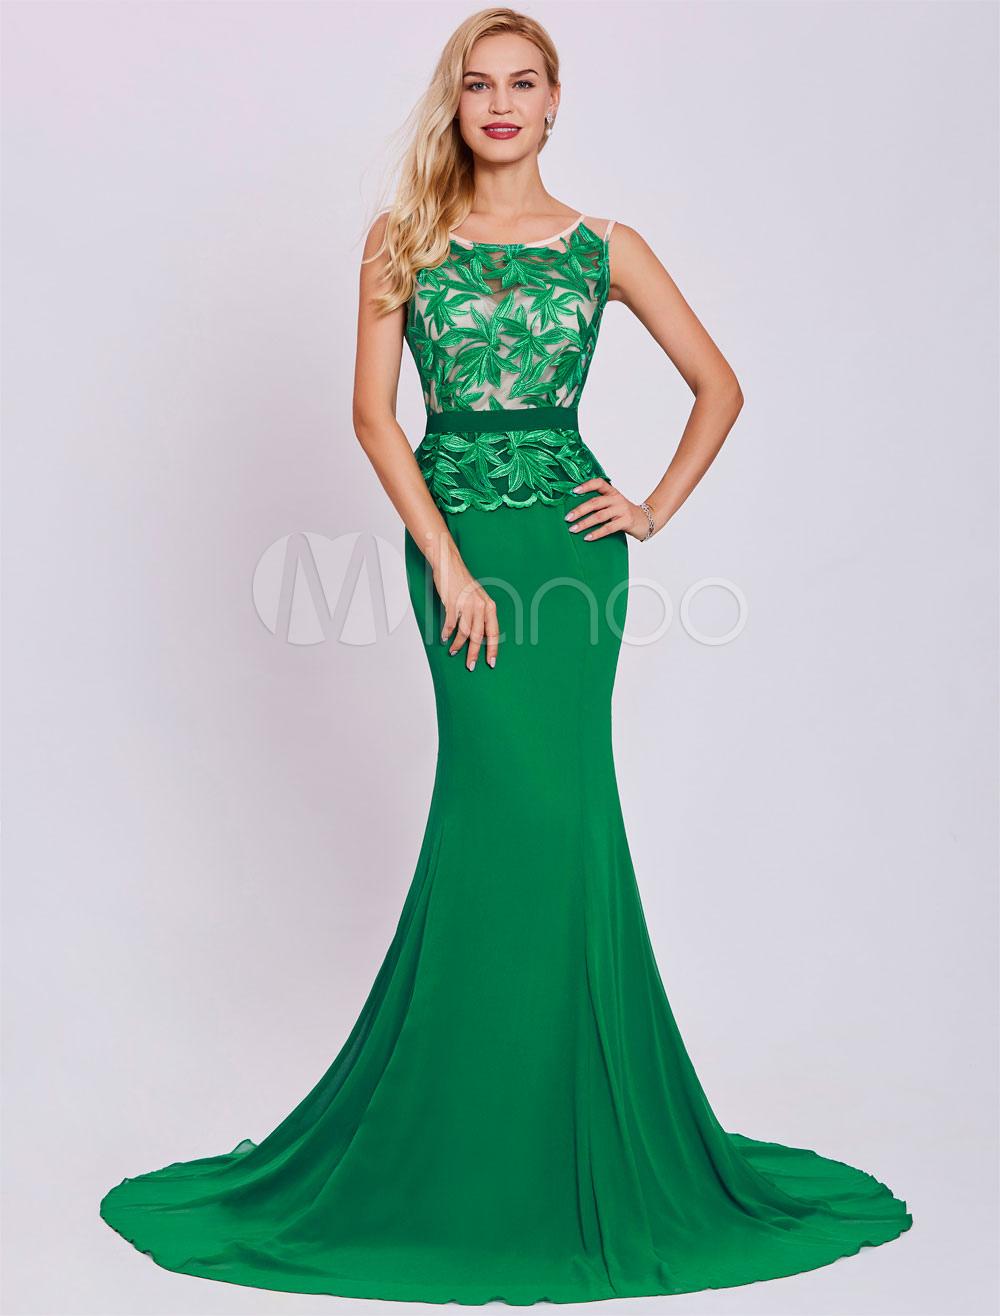 Evening Dresses Mermaid Lace Illusion Sleeveless Sash Dark Green Wedding Party Dress